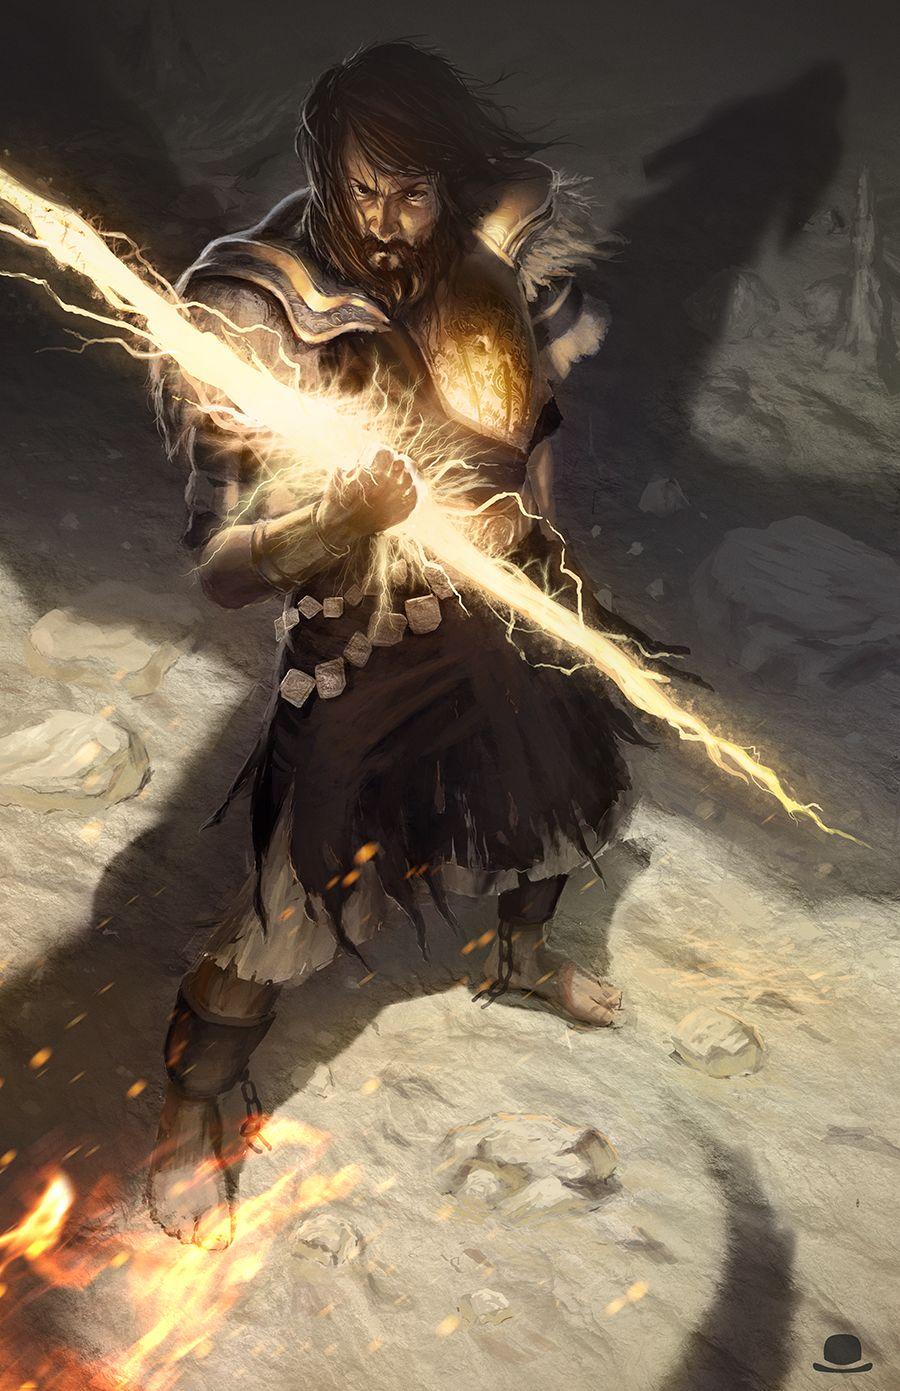 lightning weapon reference...  Lord of Sunlight by sstarkm.deviantart.com on @deviantART